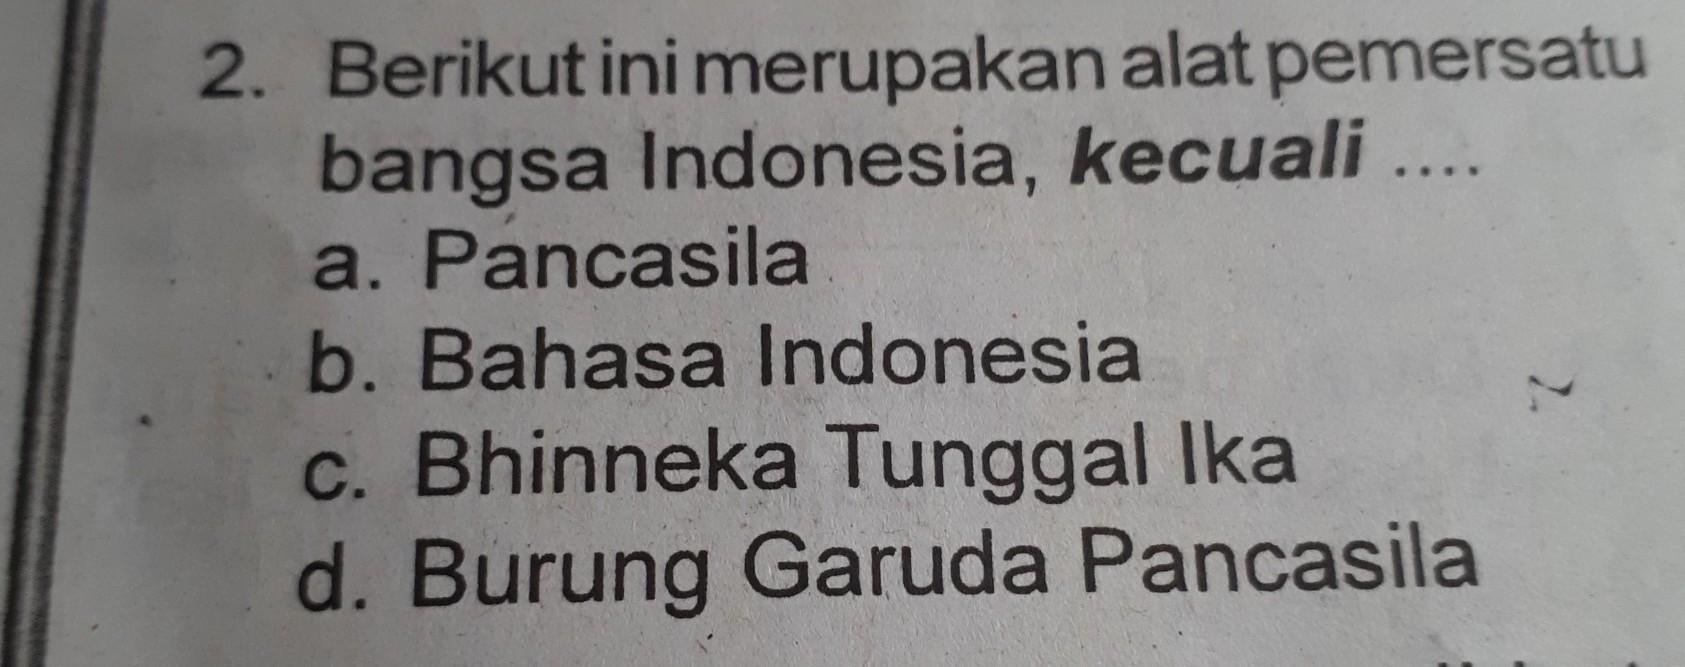 Berikut Ini Merupakan Alat Pemersatu Bangsa Indonesia Kecuali Brainly Co Id